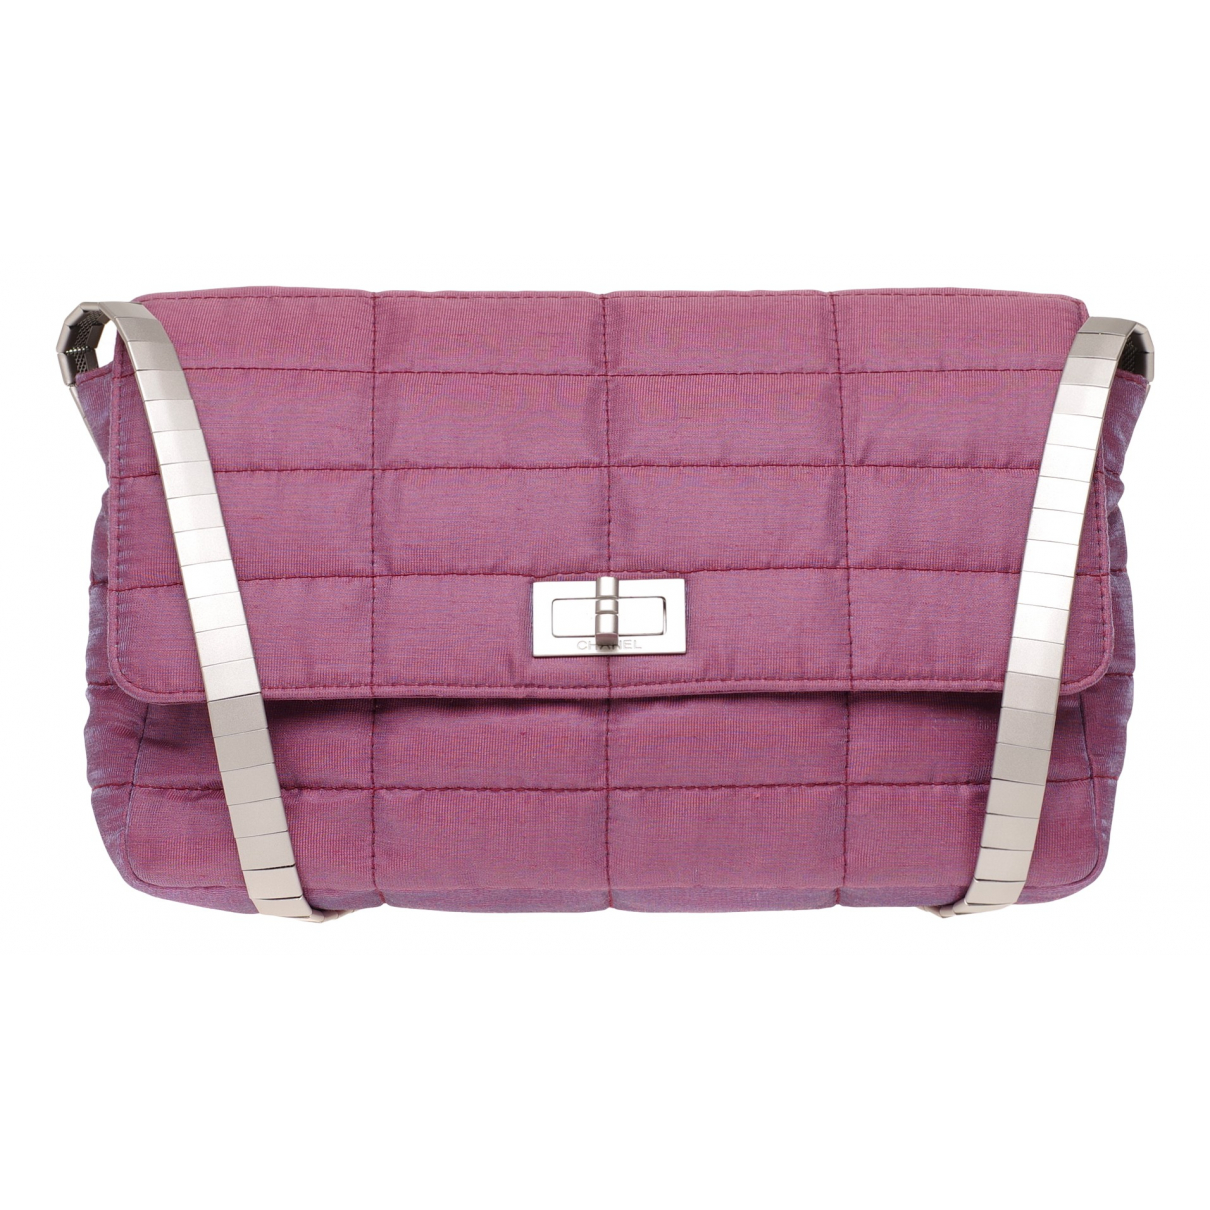 Chanel 2.55 Purple handbag for Women \N